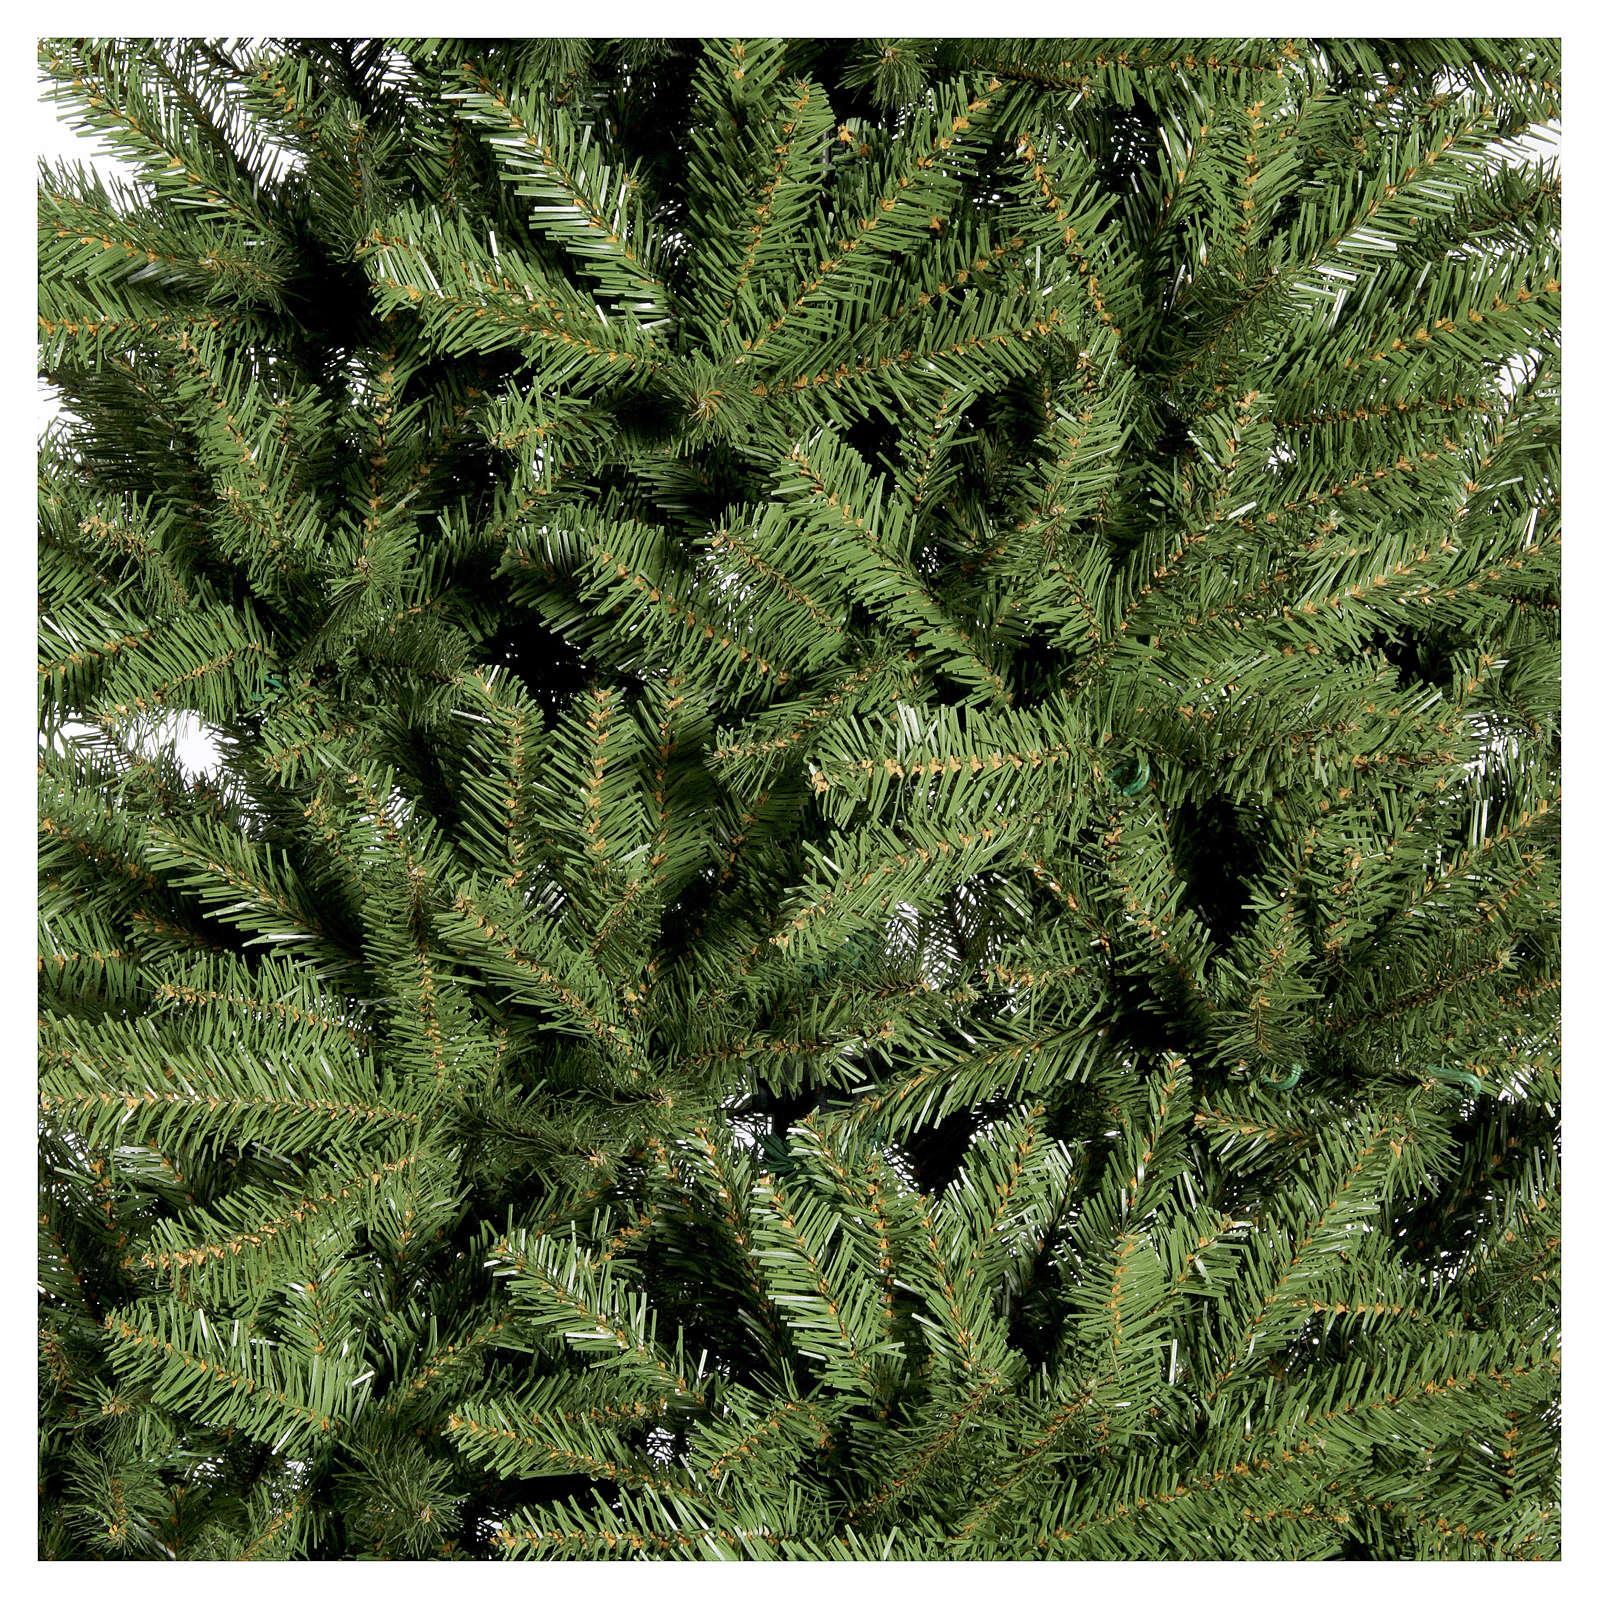 Albero di Natale artificiale 210 cm verde Dunhill Fir 3